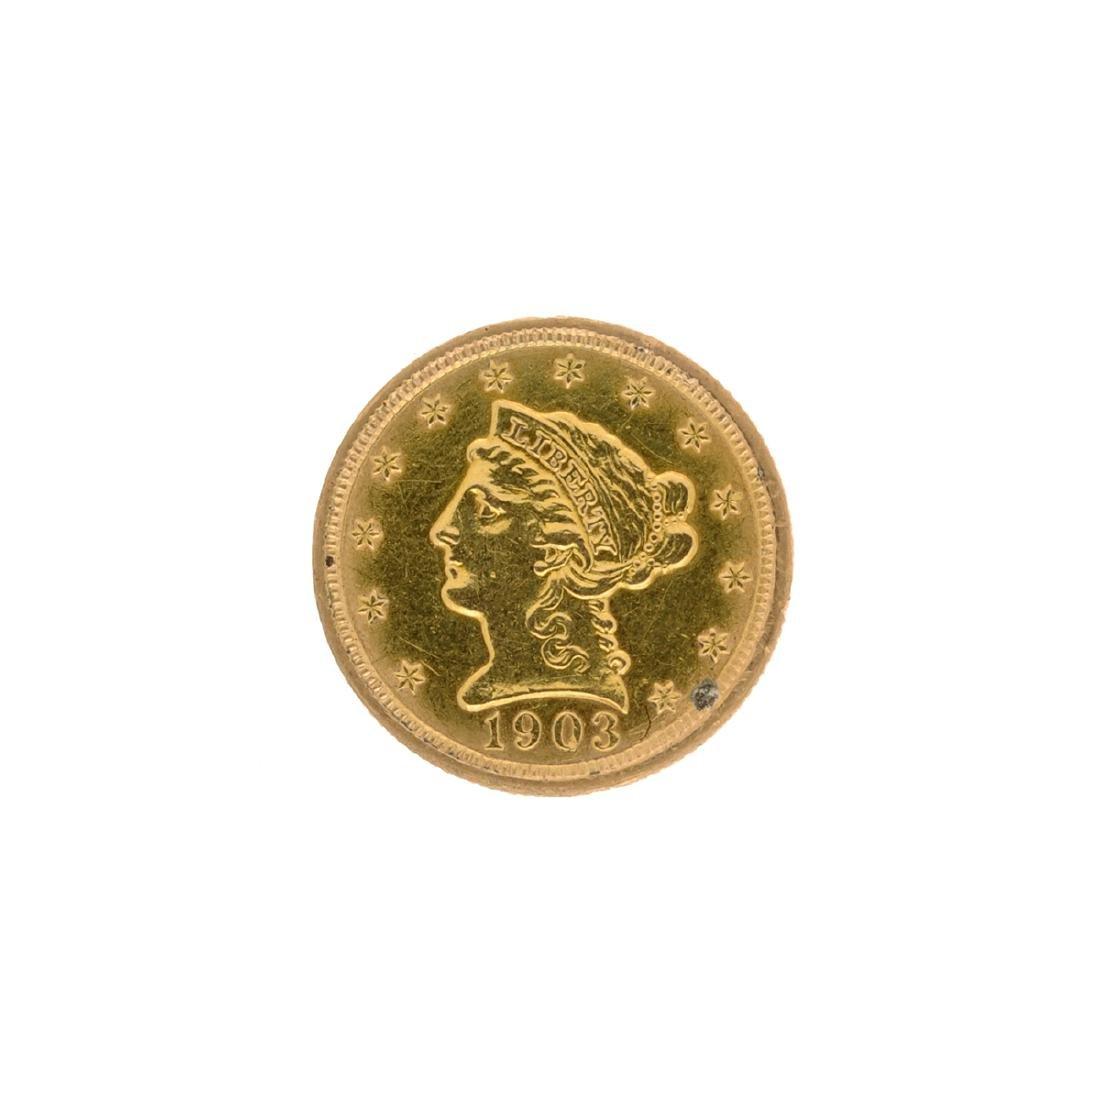 1903 $2.50 U.S. Liberty Head Gold Coin